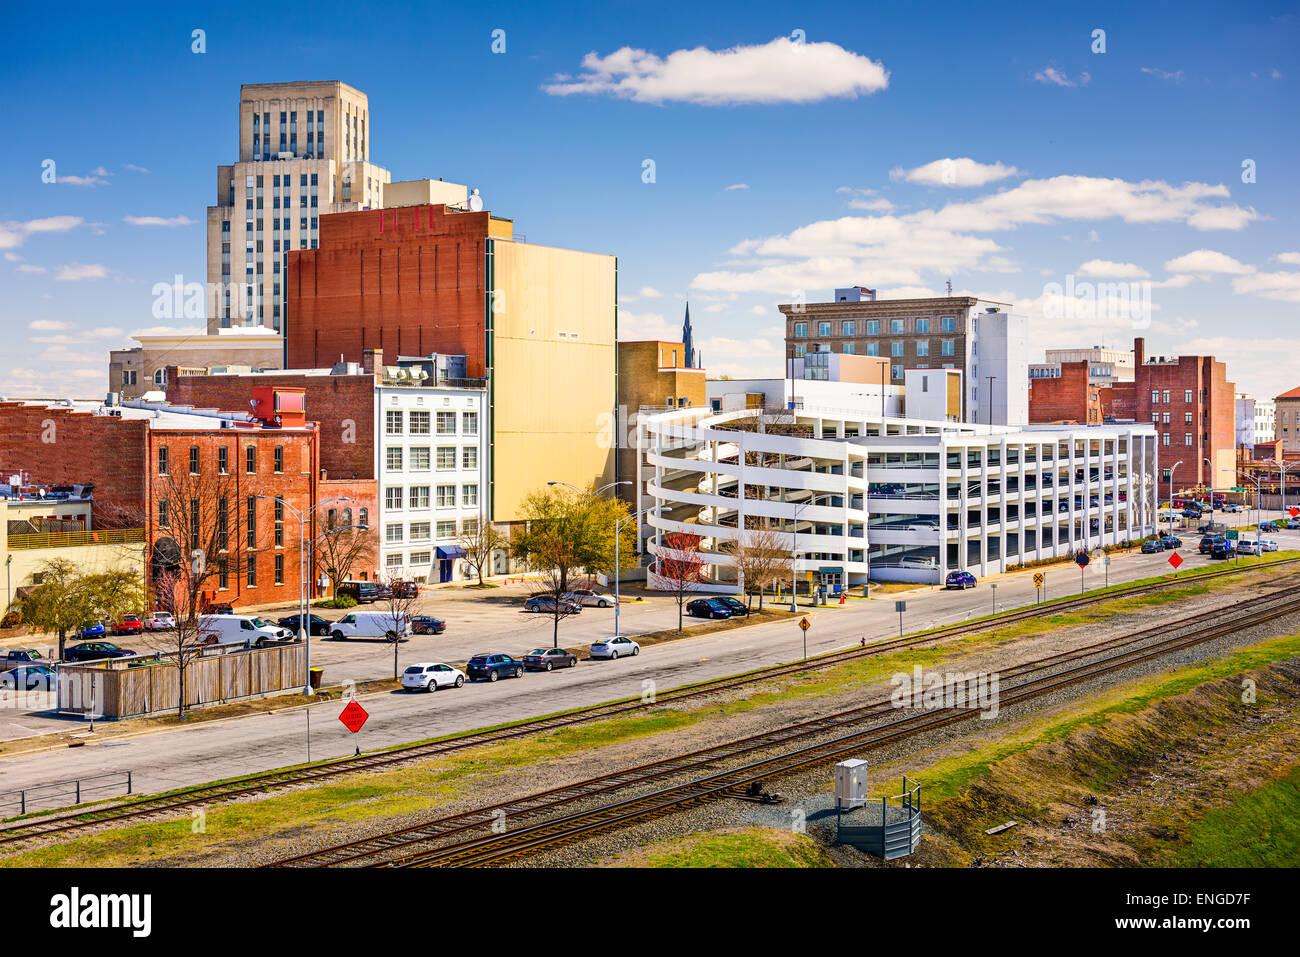 Durham, North Carolina, USA Innenstadt Stadtbild. Stockbild